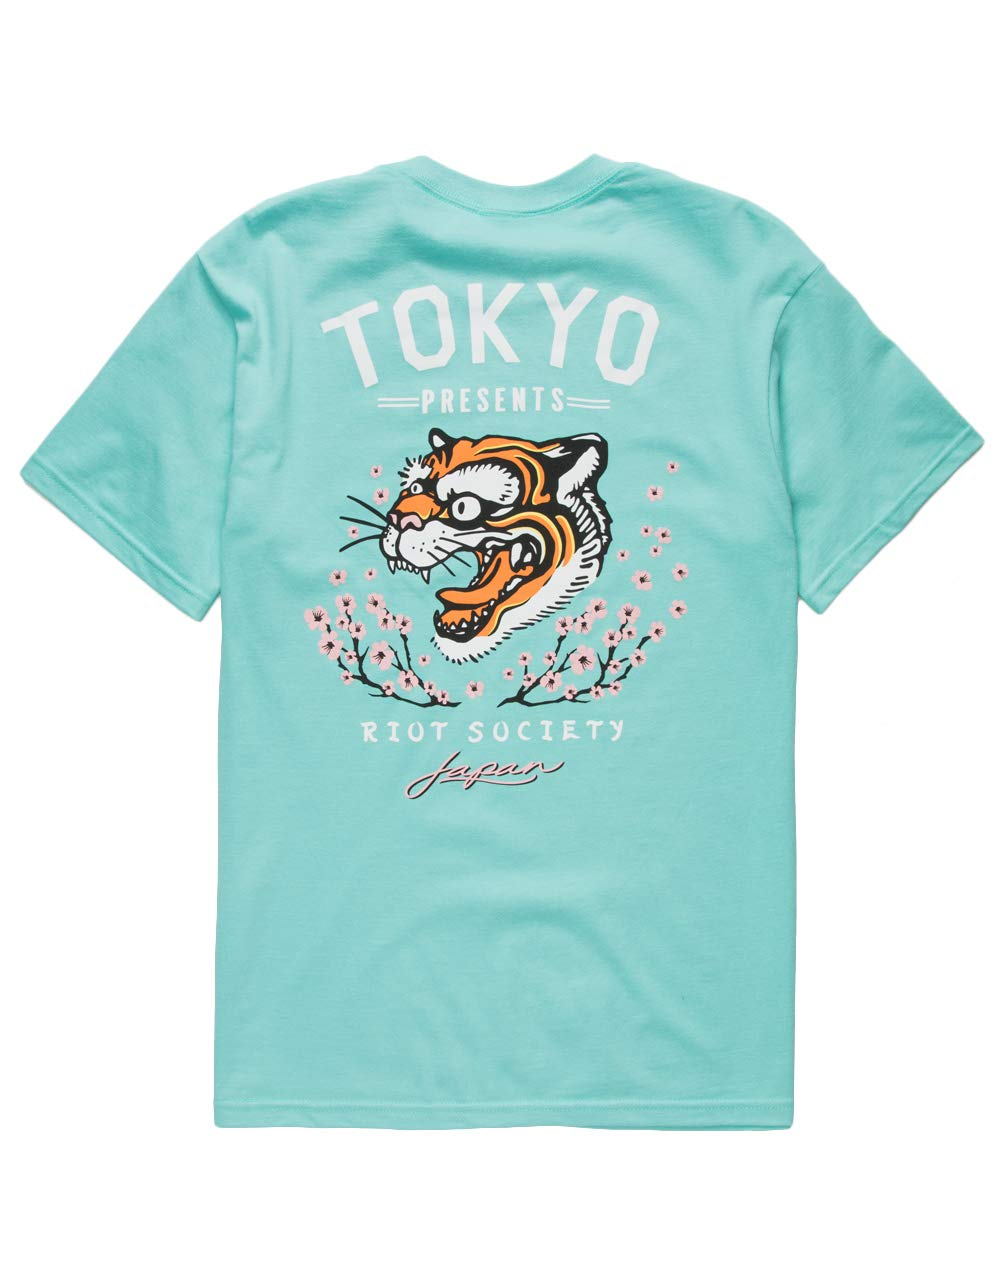 Riot Society Tiger Blossom Mint T-Shirt, Mint, X-Large